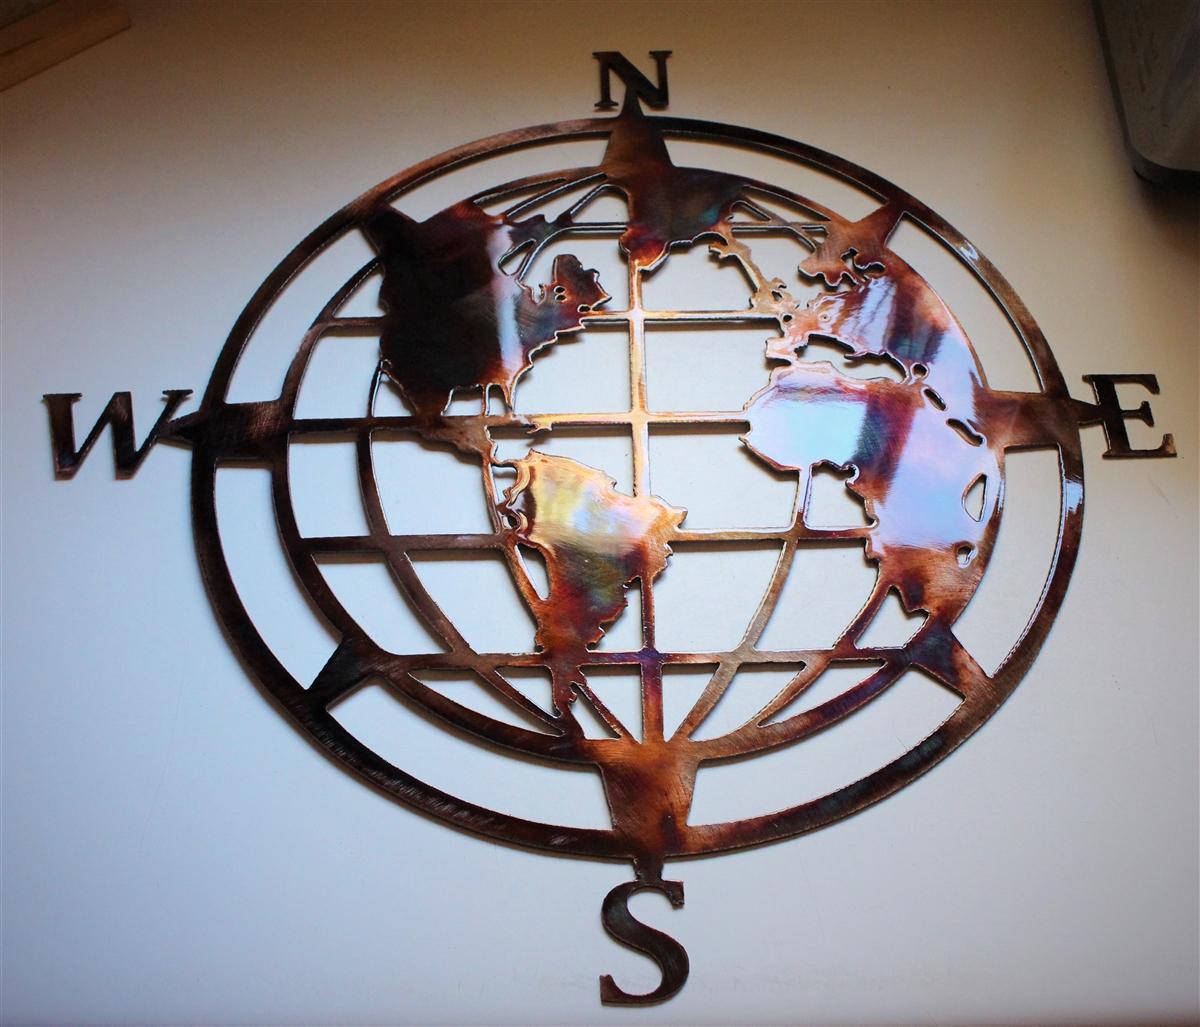 Nautical Compass Rose With Globe Center